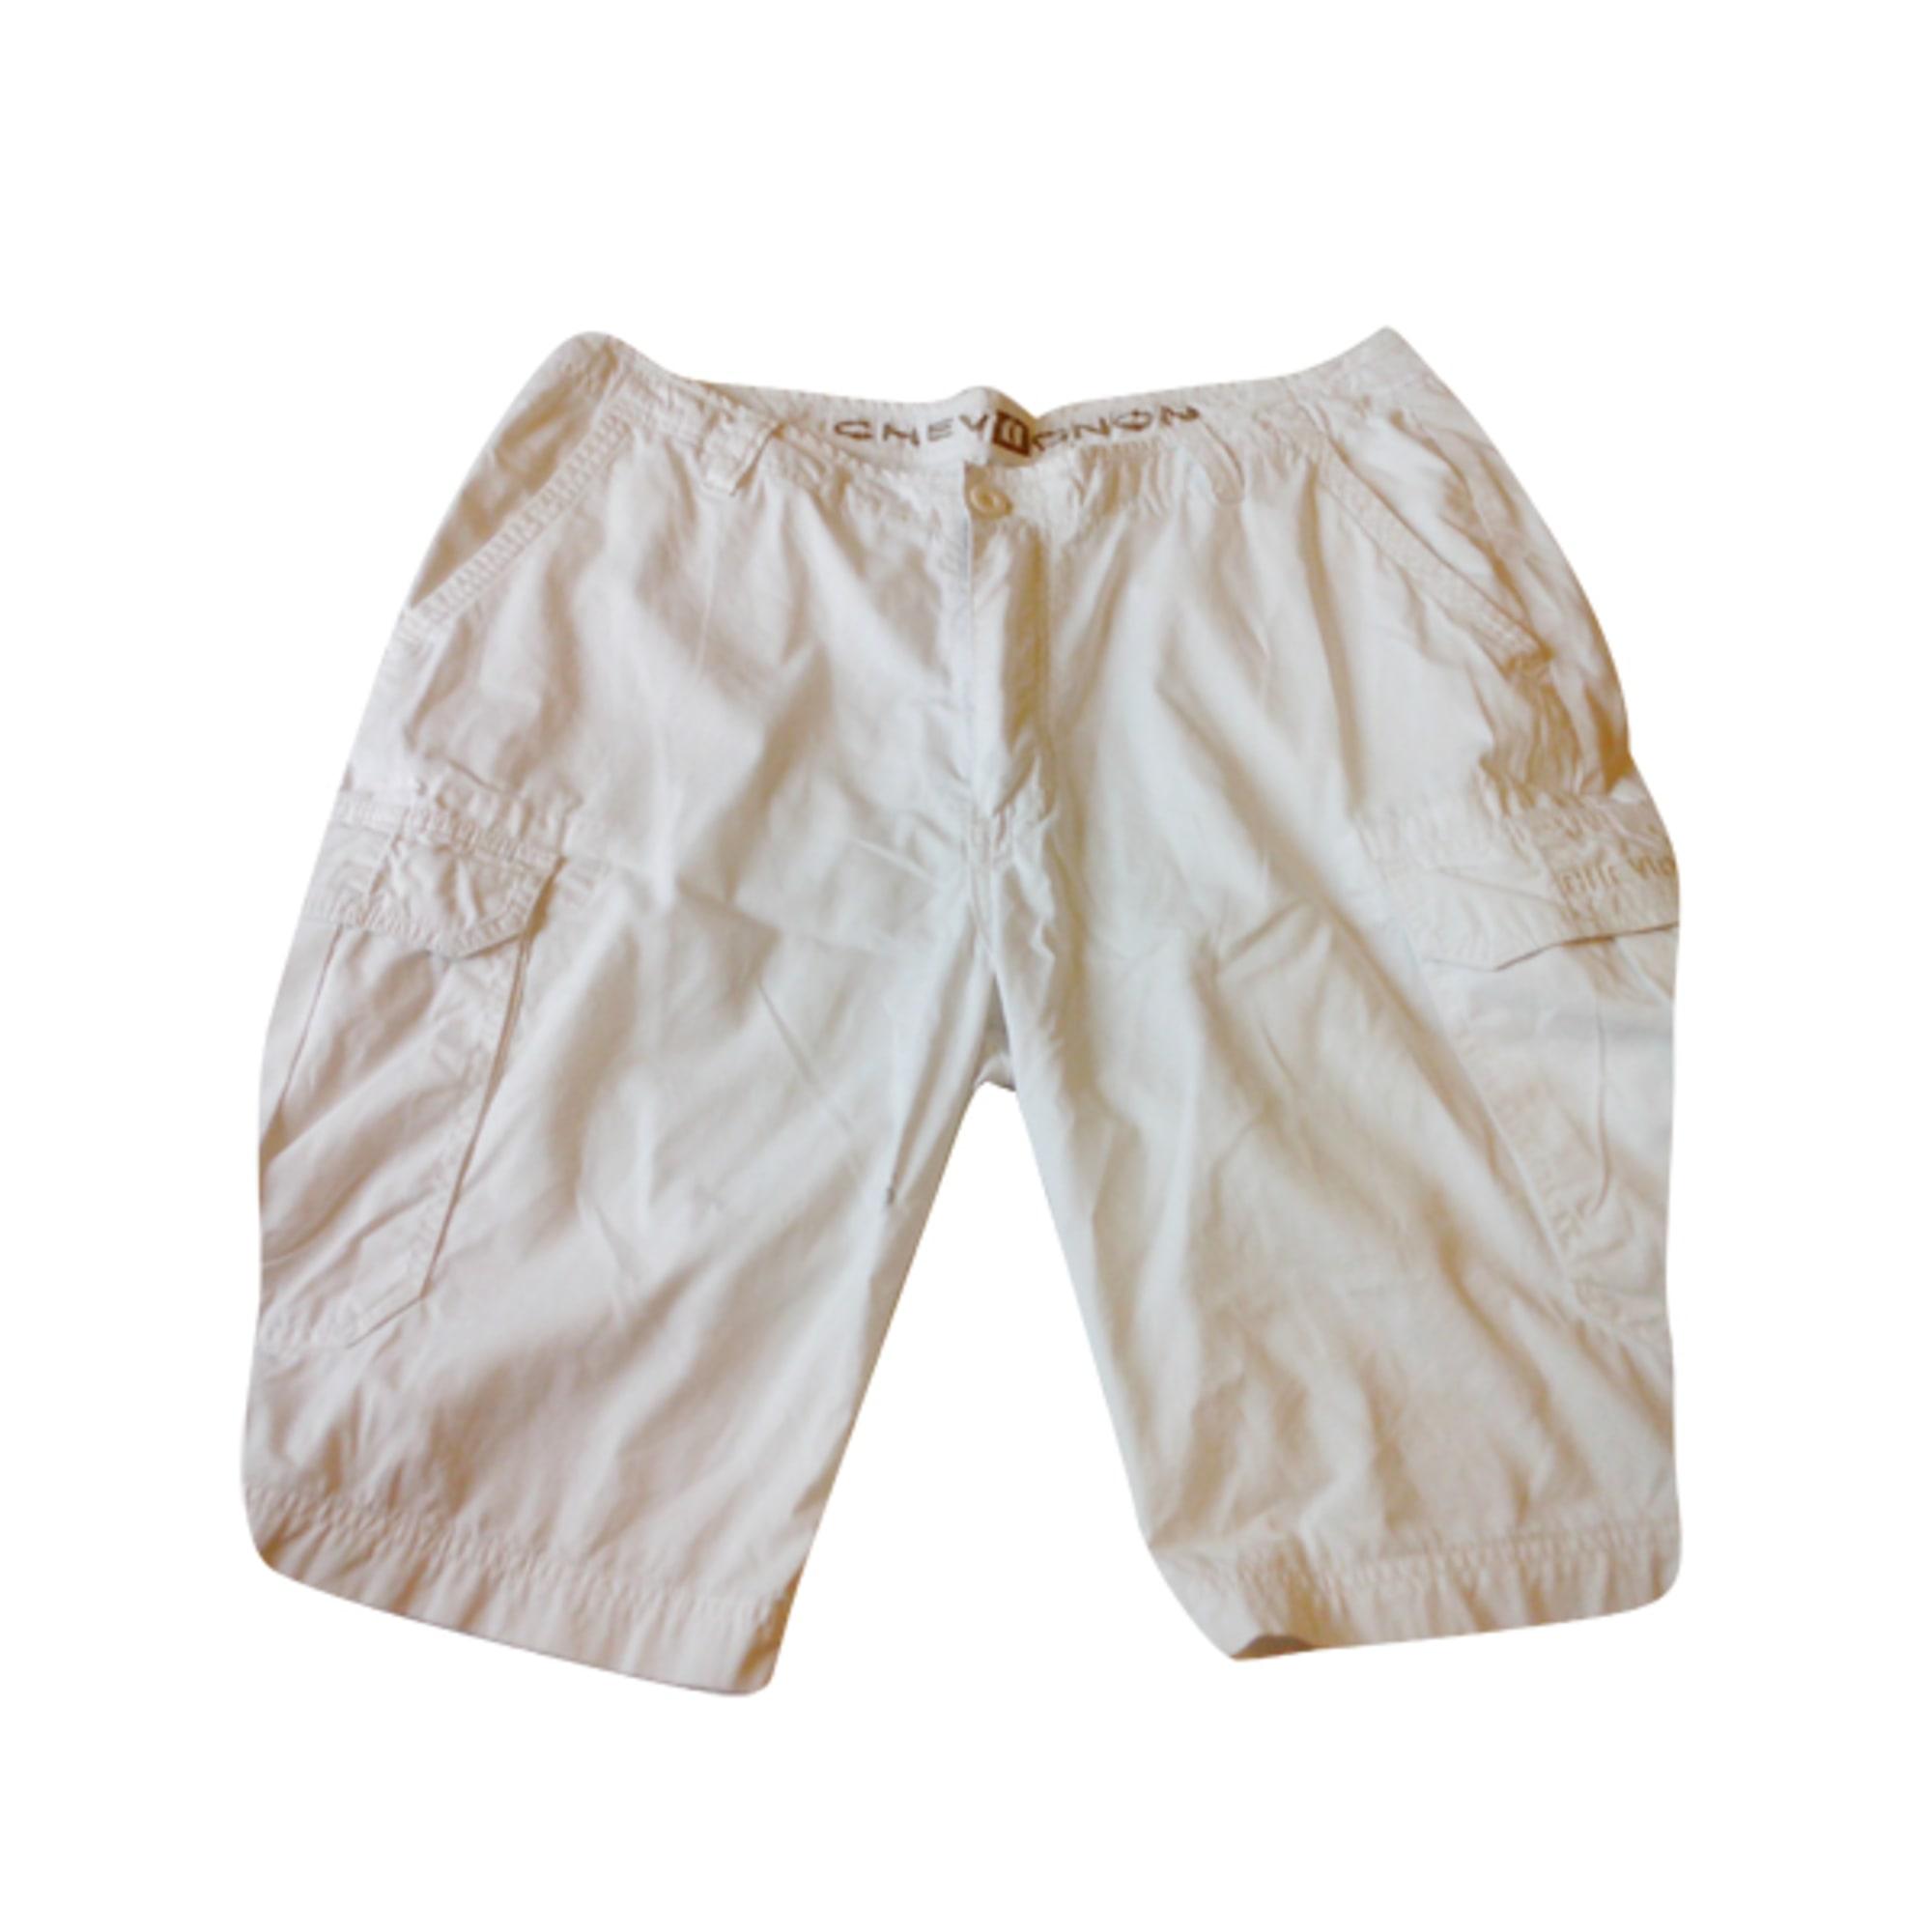 Bermuda CHEVIGNON Blanc, blanc cassé, écru